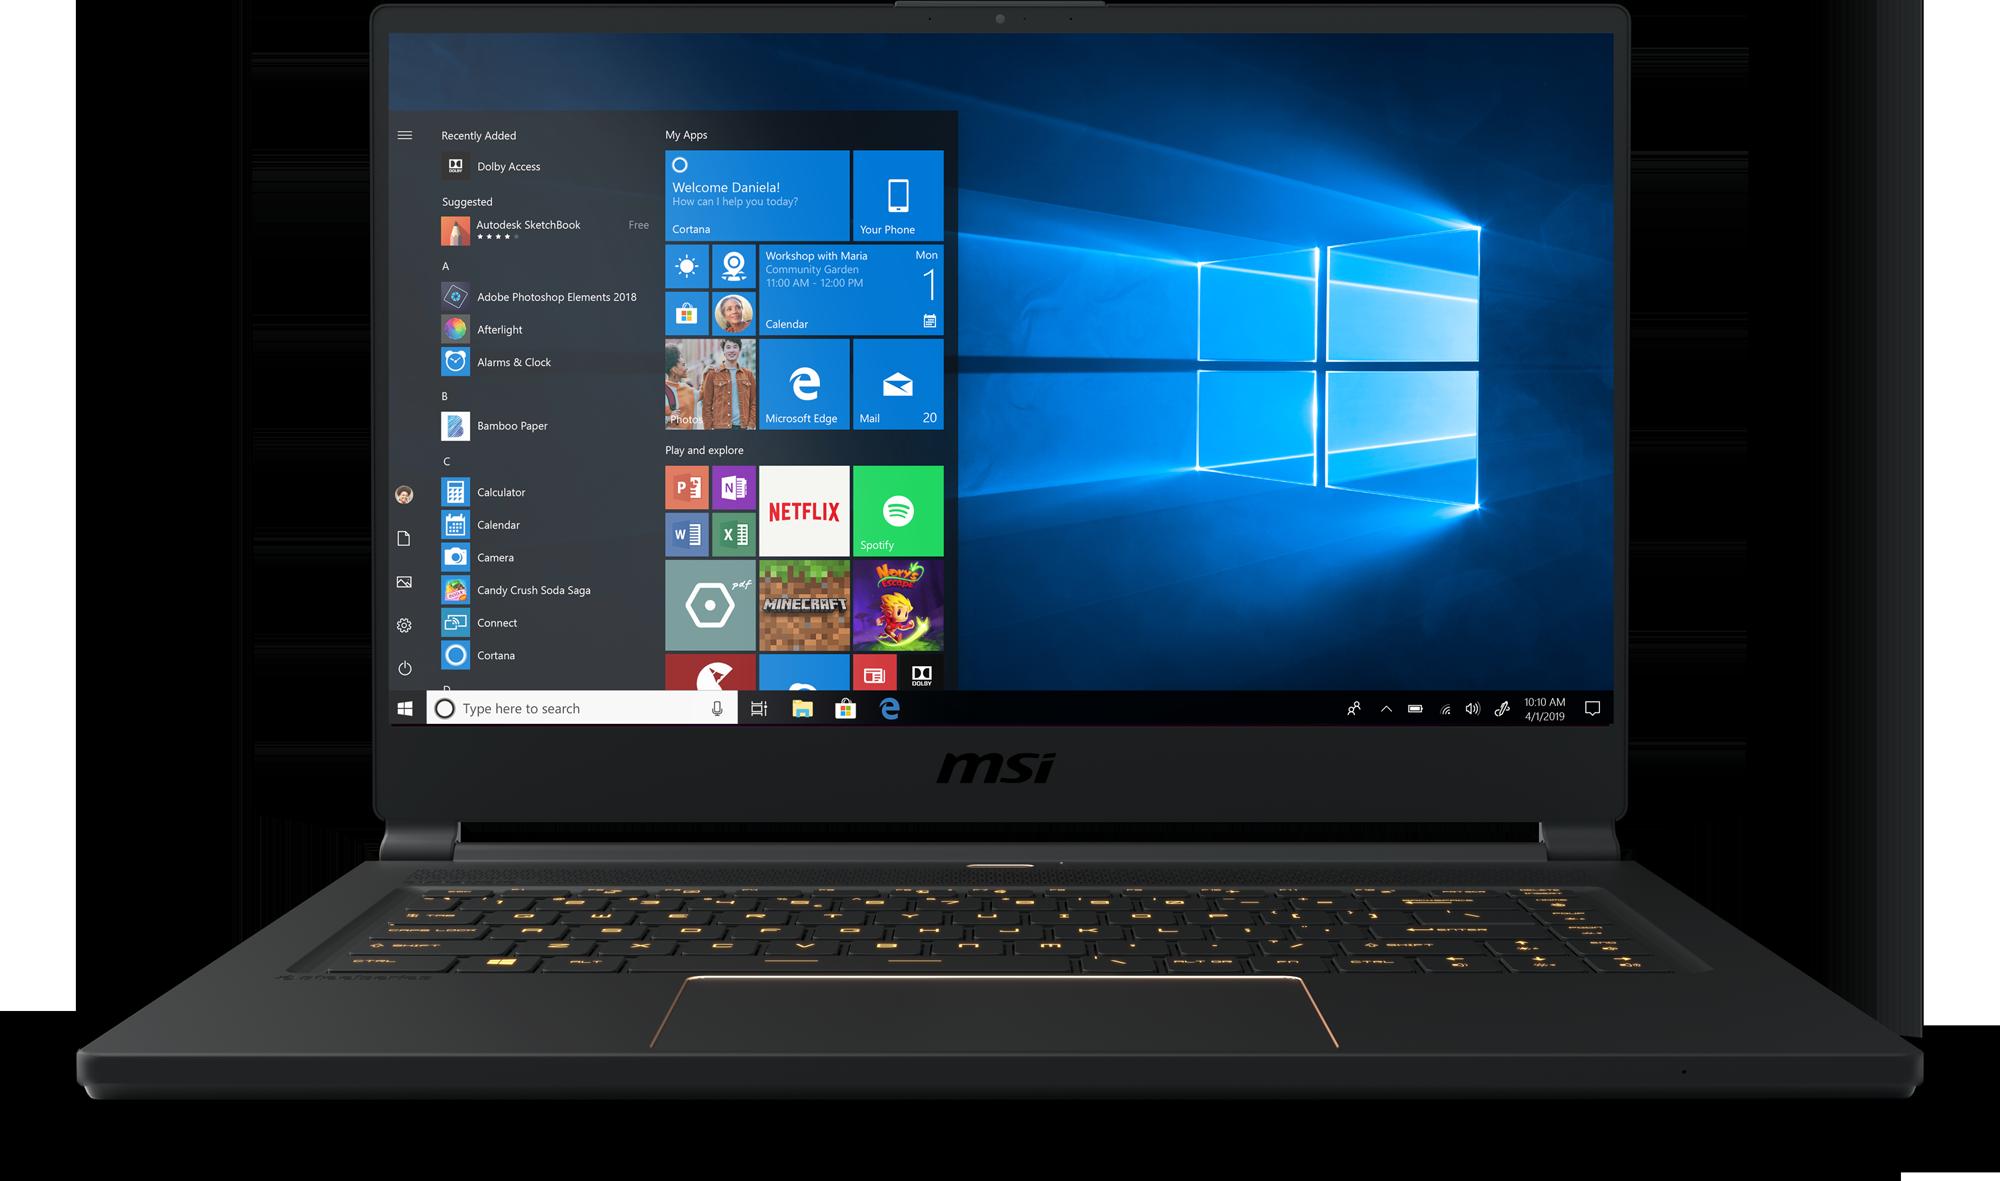 Buy MSI GS65 Stealth-422 Gaming Laptop - Microsoft Store